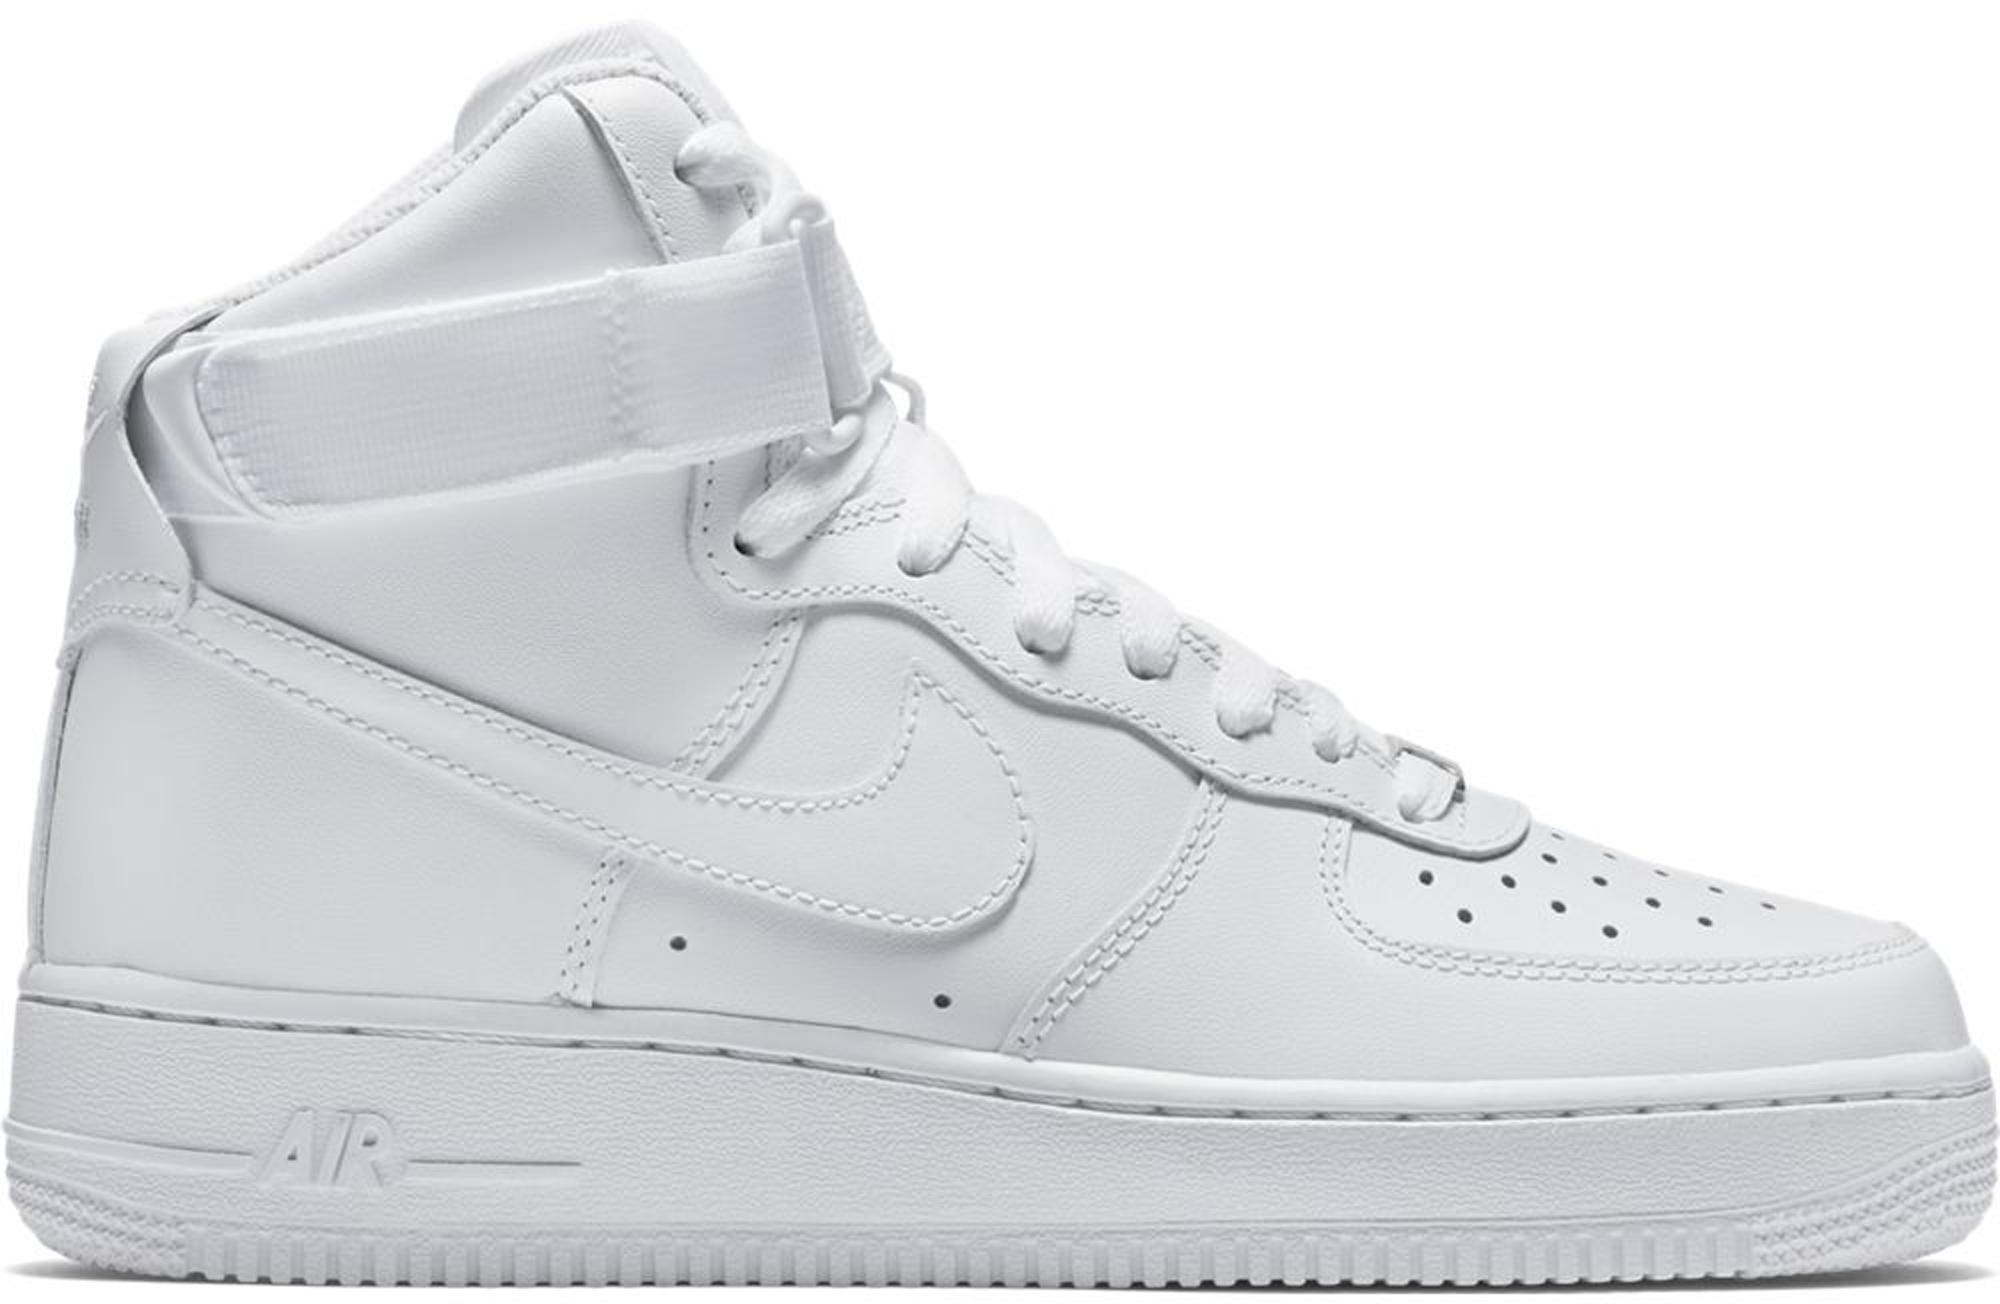 Nike Air Force 1 07 Laag Wit online bij